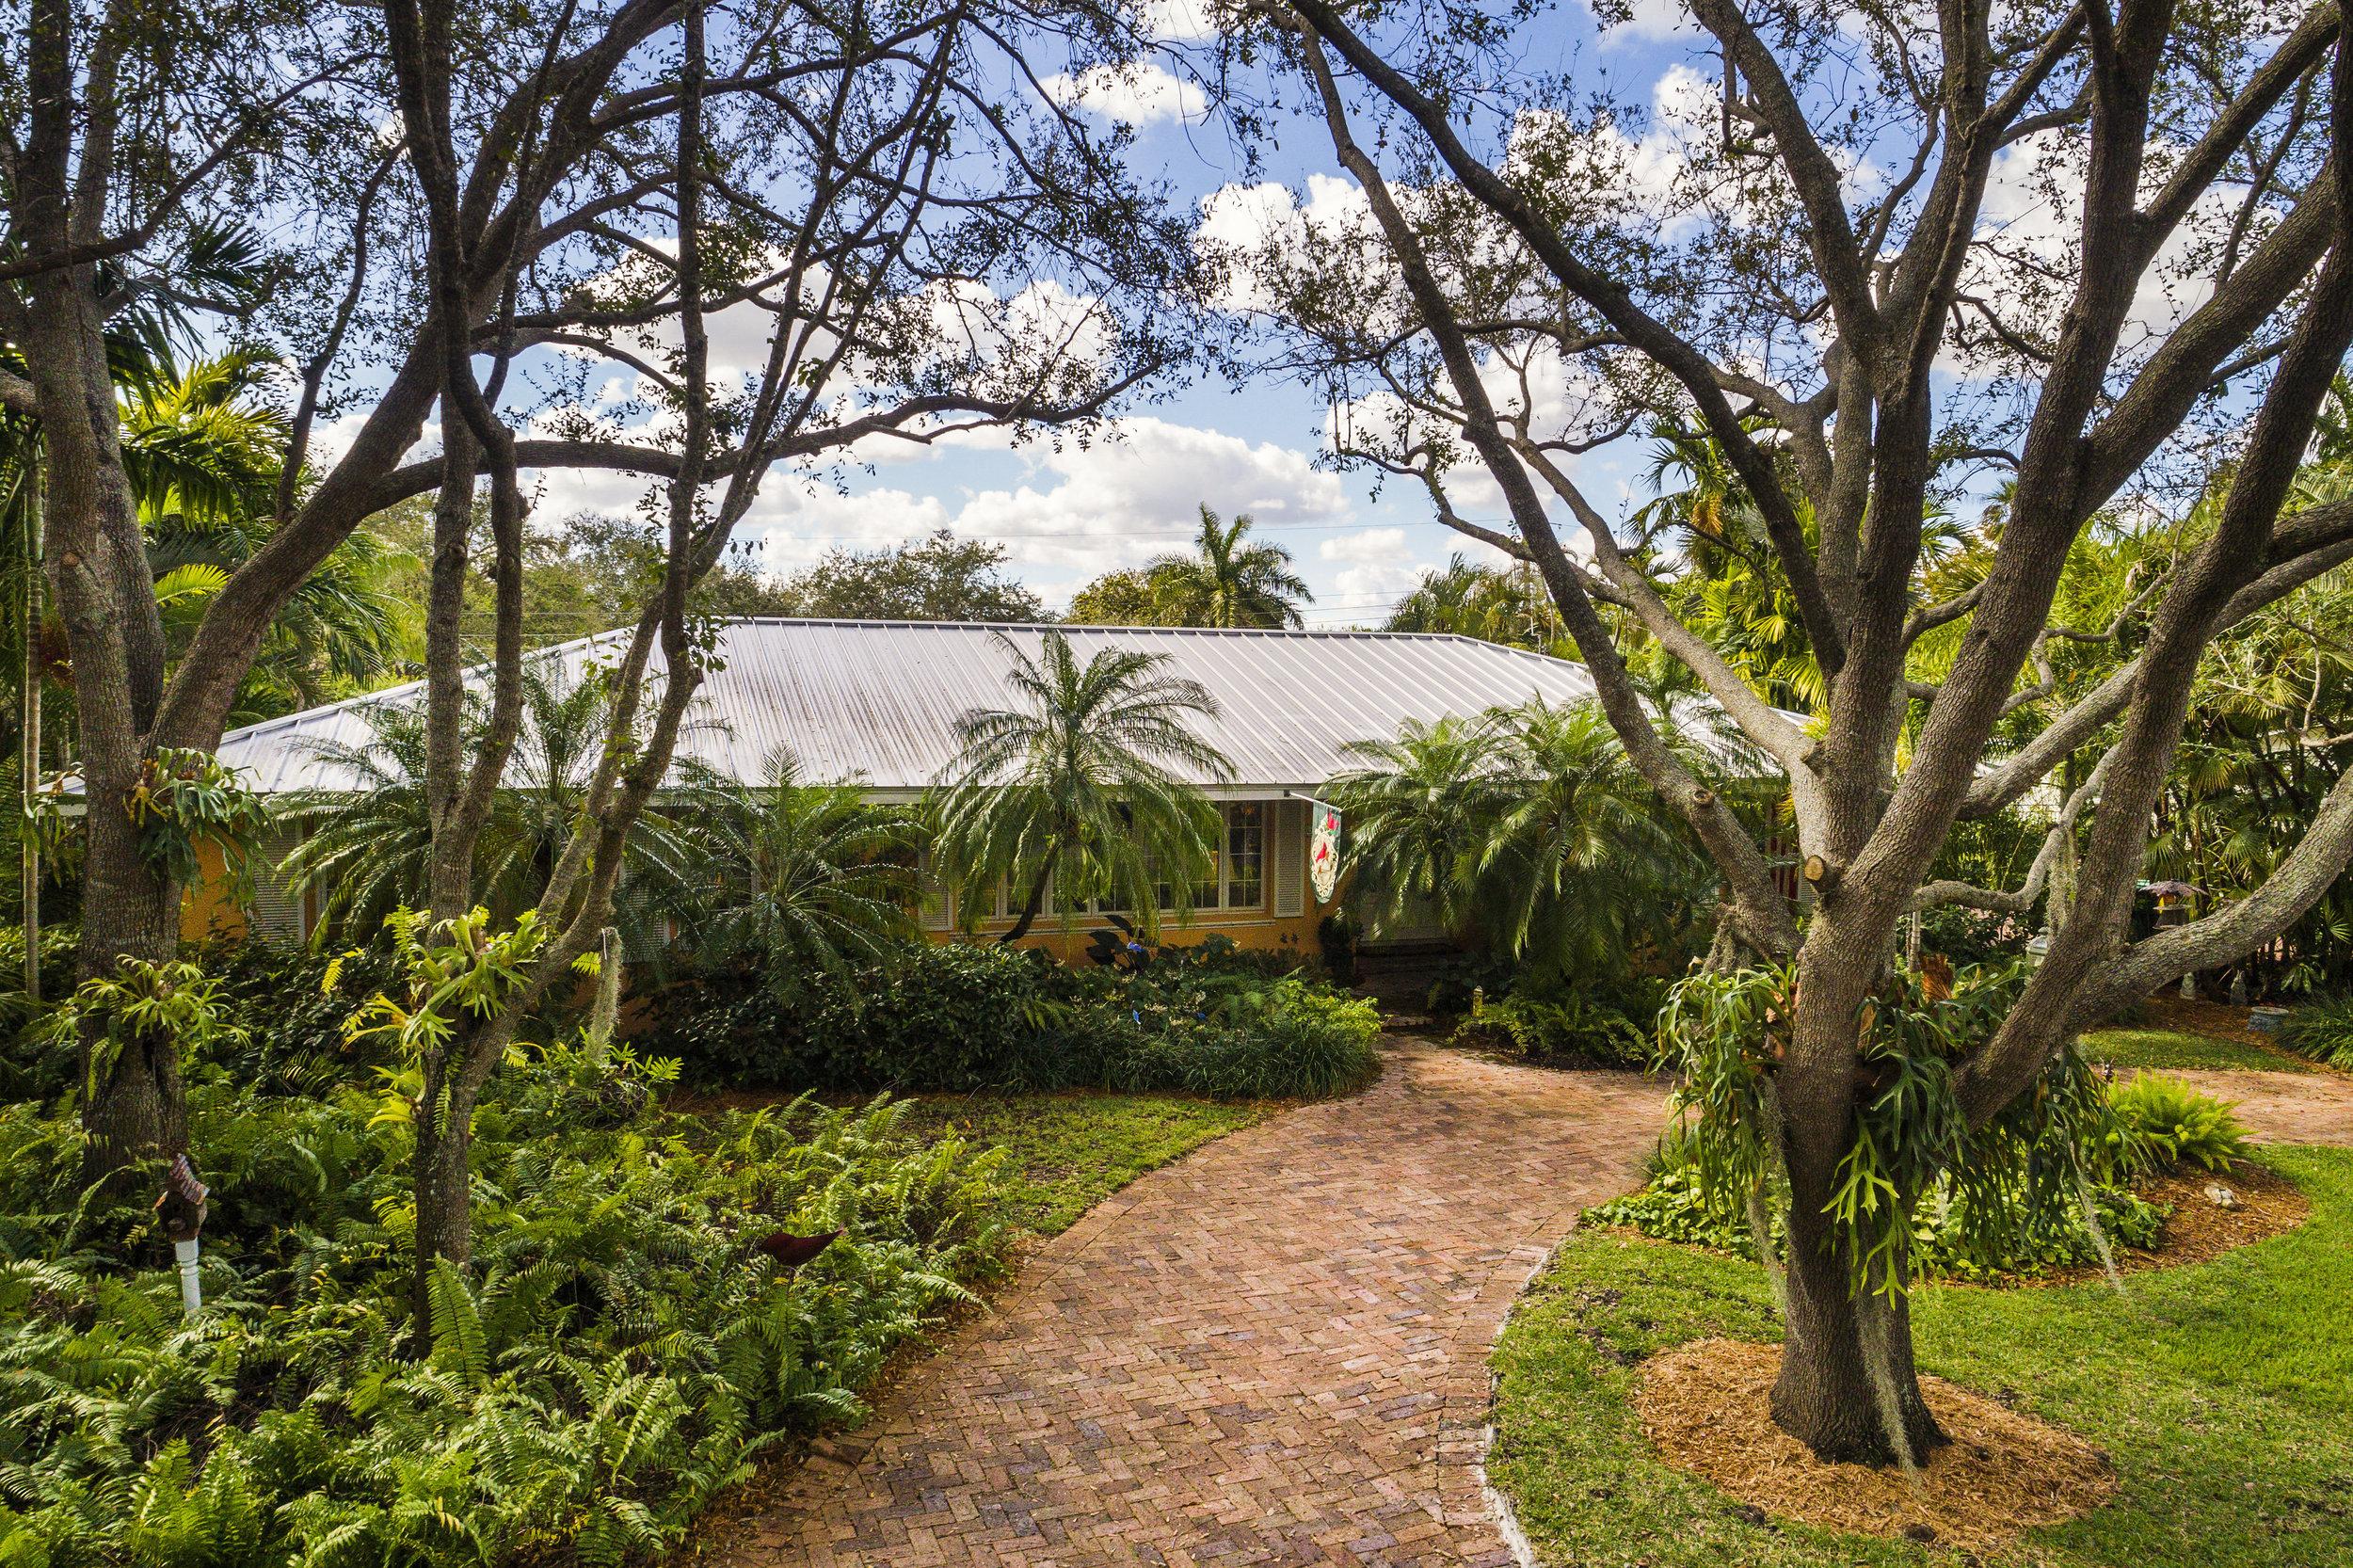 palmetto island new listing pinecrest